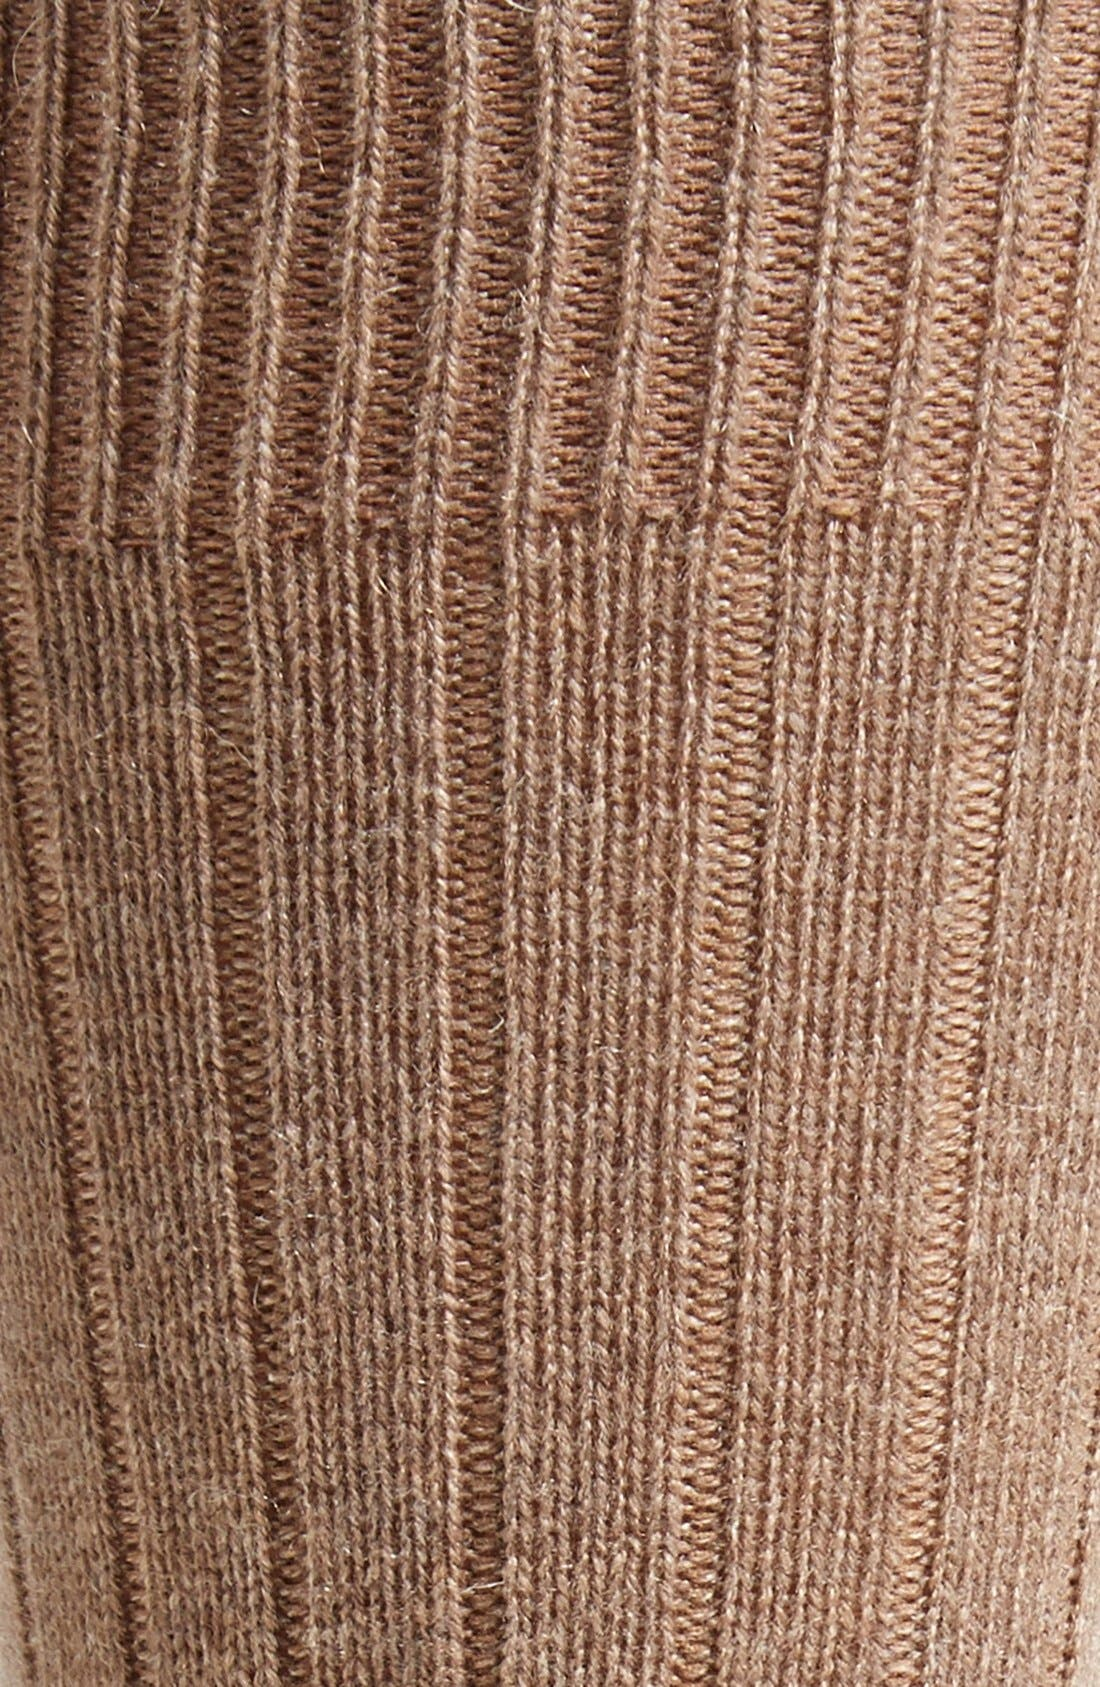 'Waddington' Cashmere Blend Mid Calf Socks,                             Alternate thumbnail 18, color,